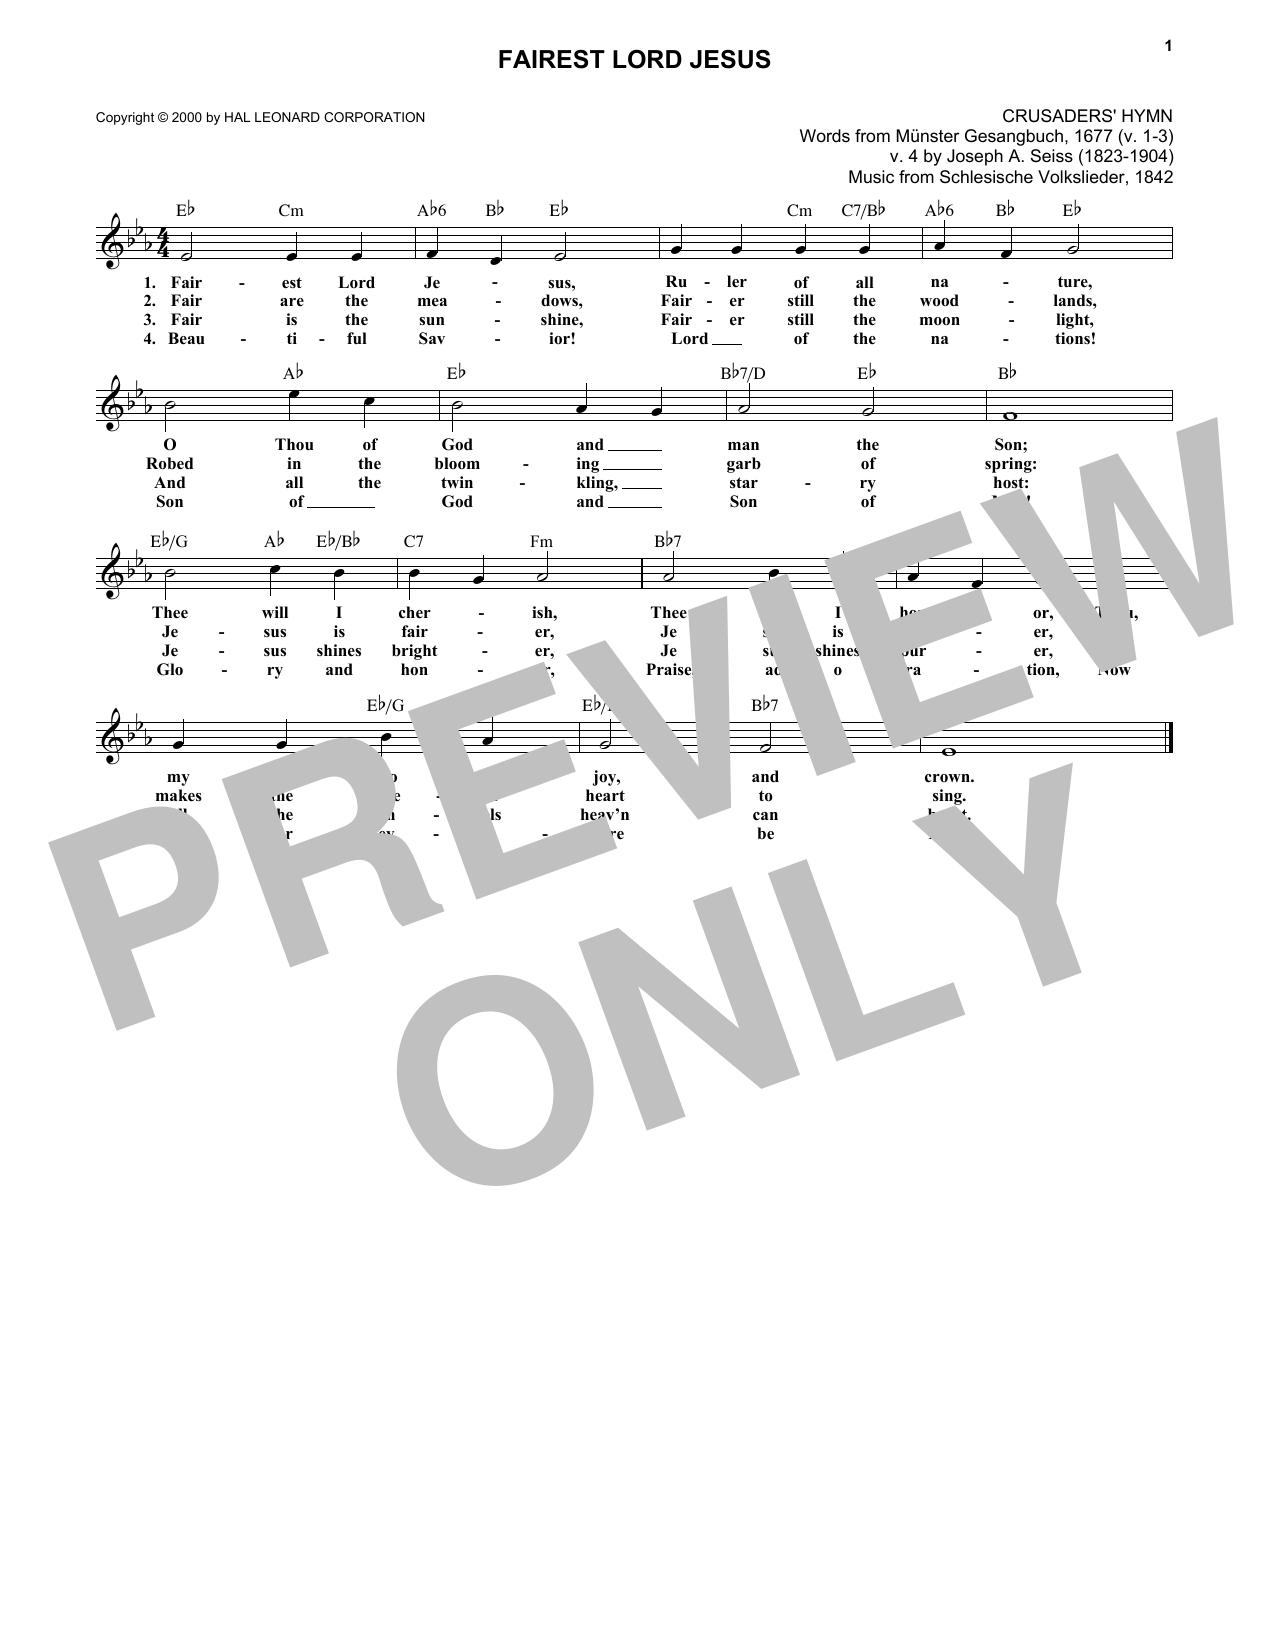 Munster Gesangbuch